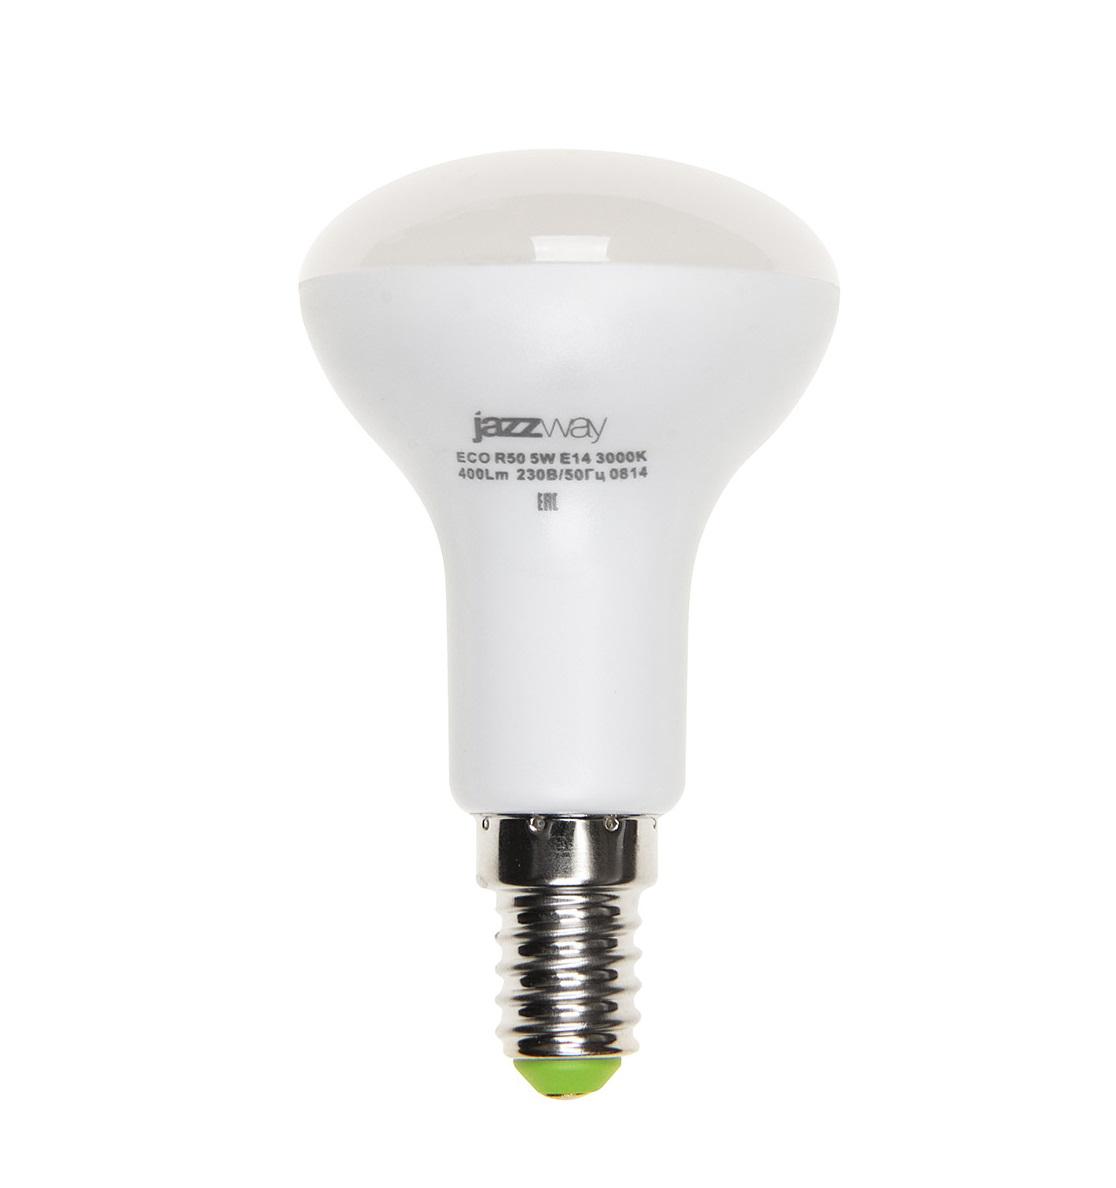 Лампа светодиодная Jazzway Pled-eco-r50 (331824) лампа настольная jazzway ptl 1128 blue